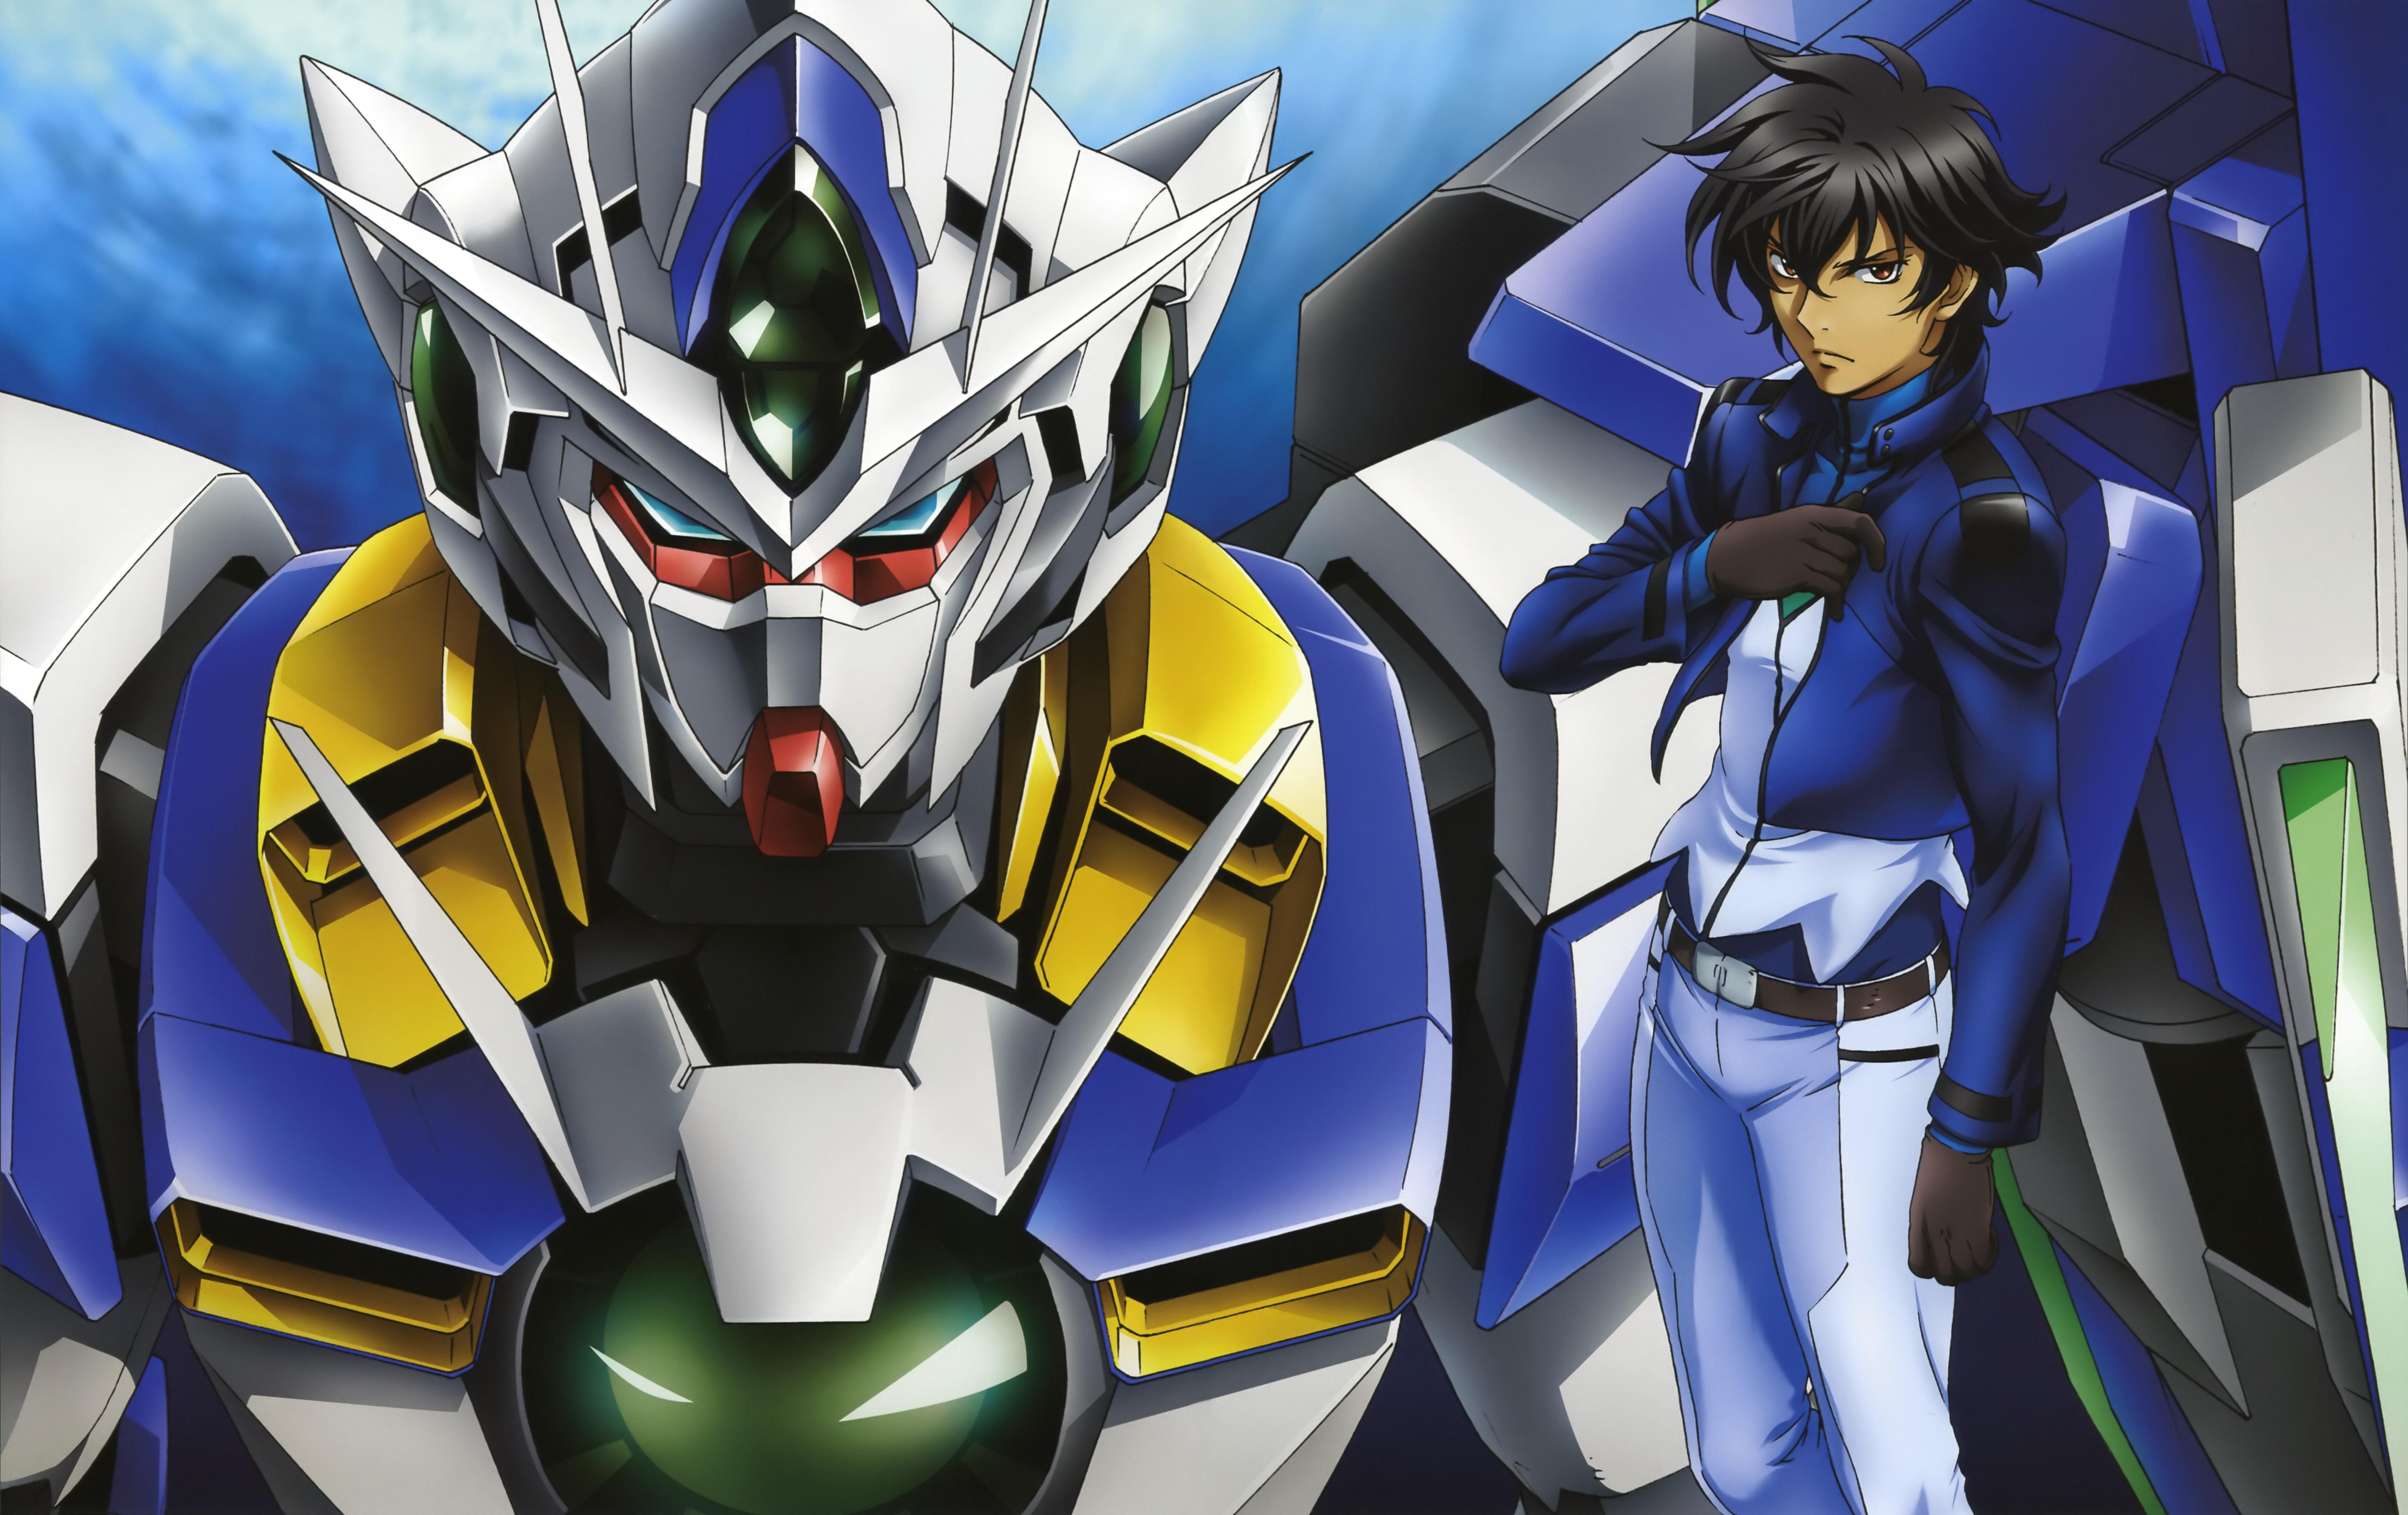 Mobile Suit Gundam 00 5k Retina Ultra HD Wallpaper ...